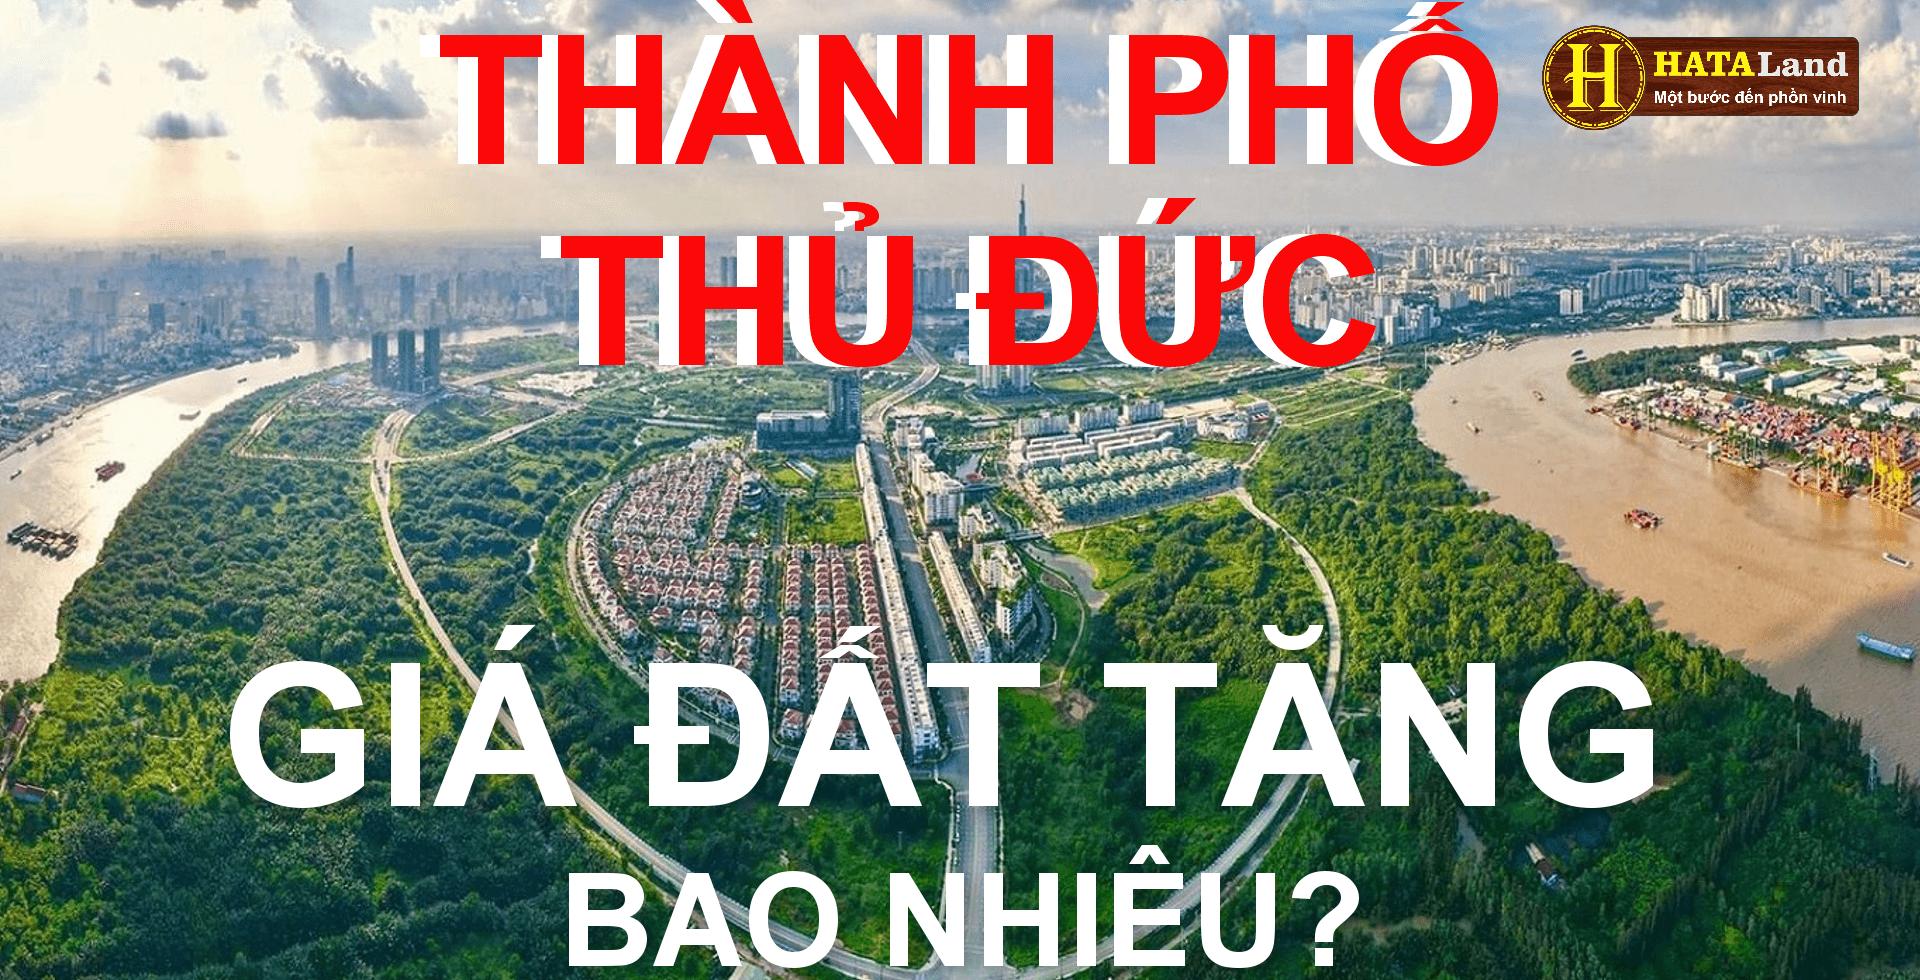 NHA-DAT-THU-DUC-THANH-PHO-THU-DUC